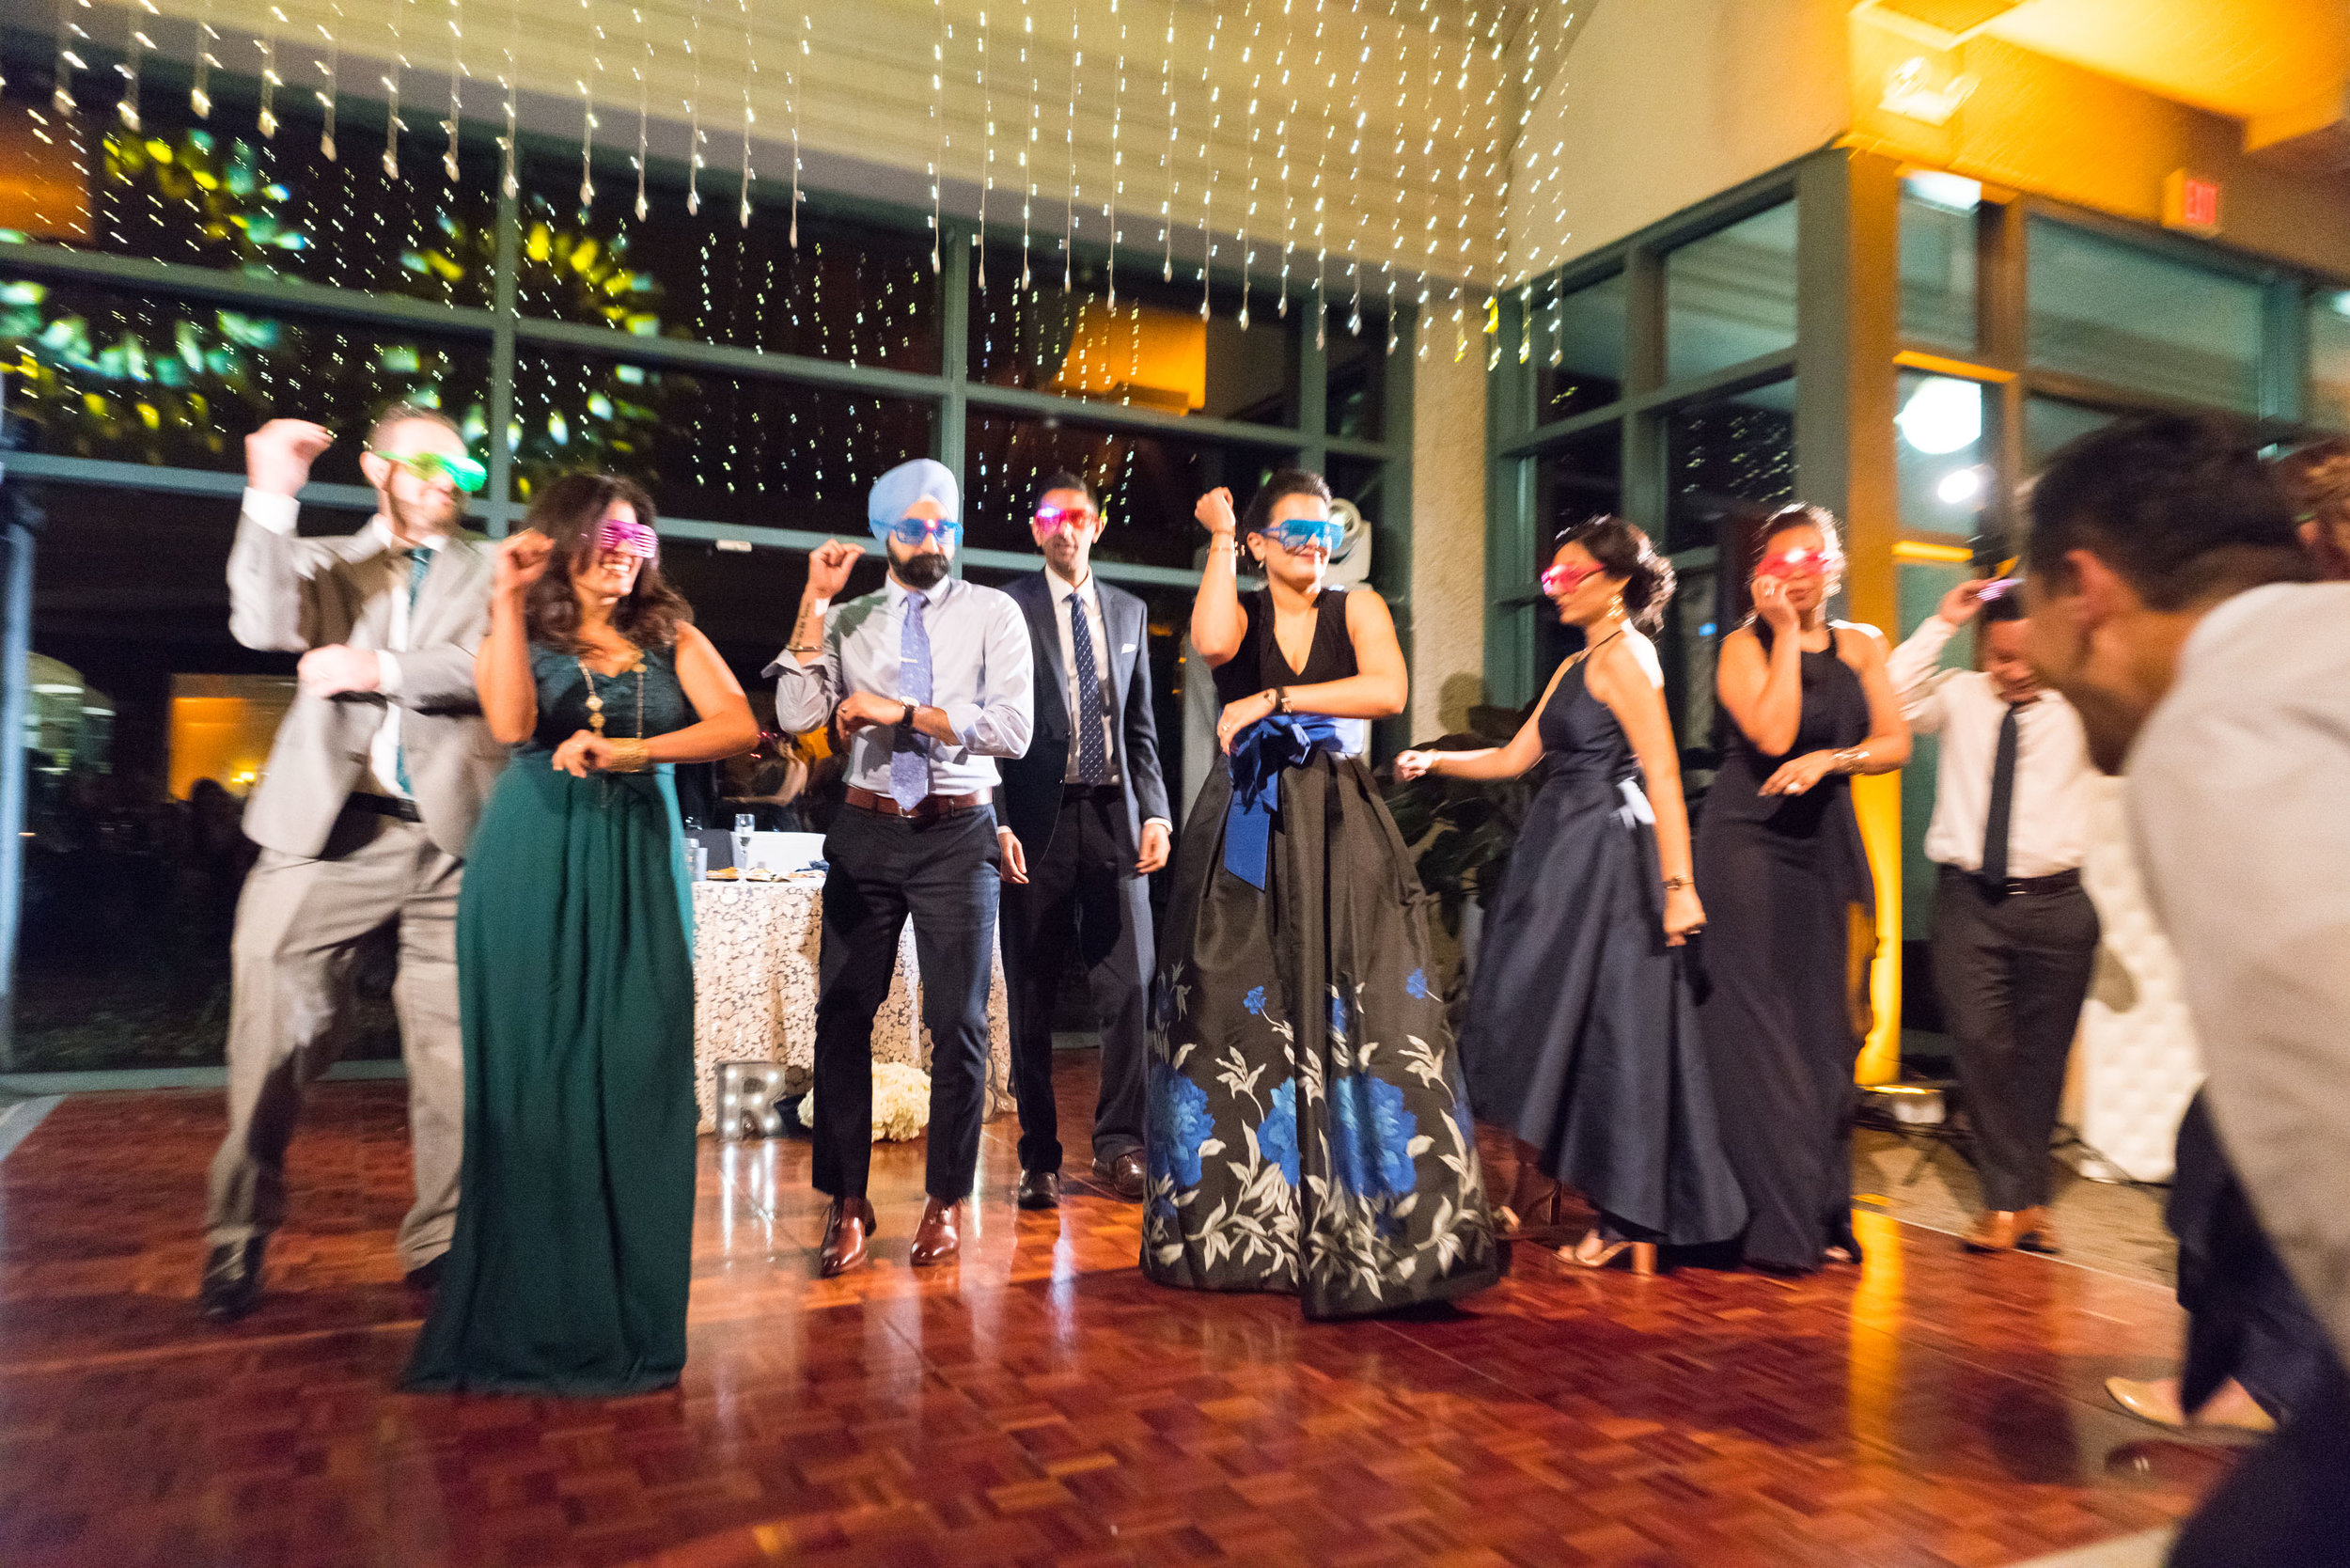 Choreographed flash mob dance wedding photos